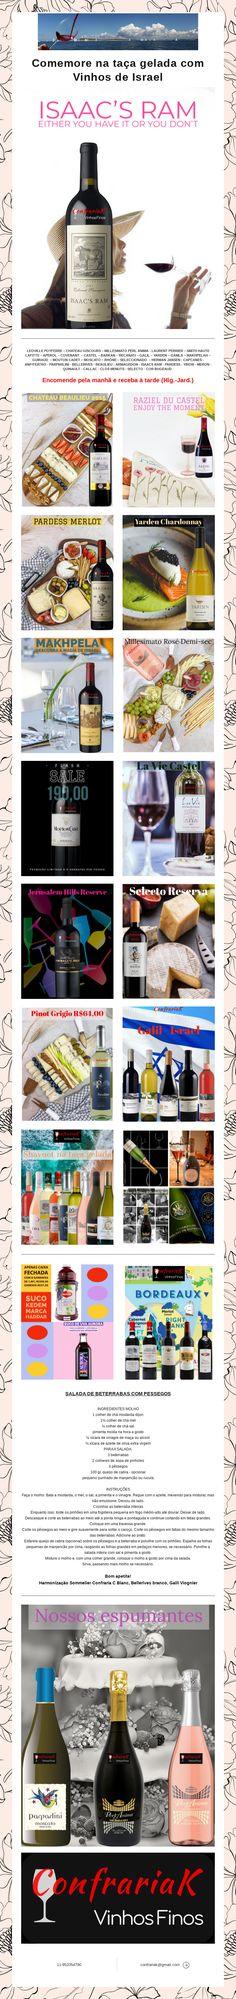 Mouton Cadet, Laurent Perrier, The Covenant, Wine Pairings